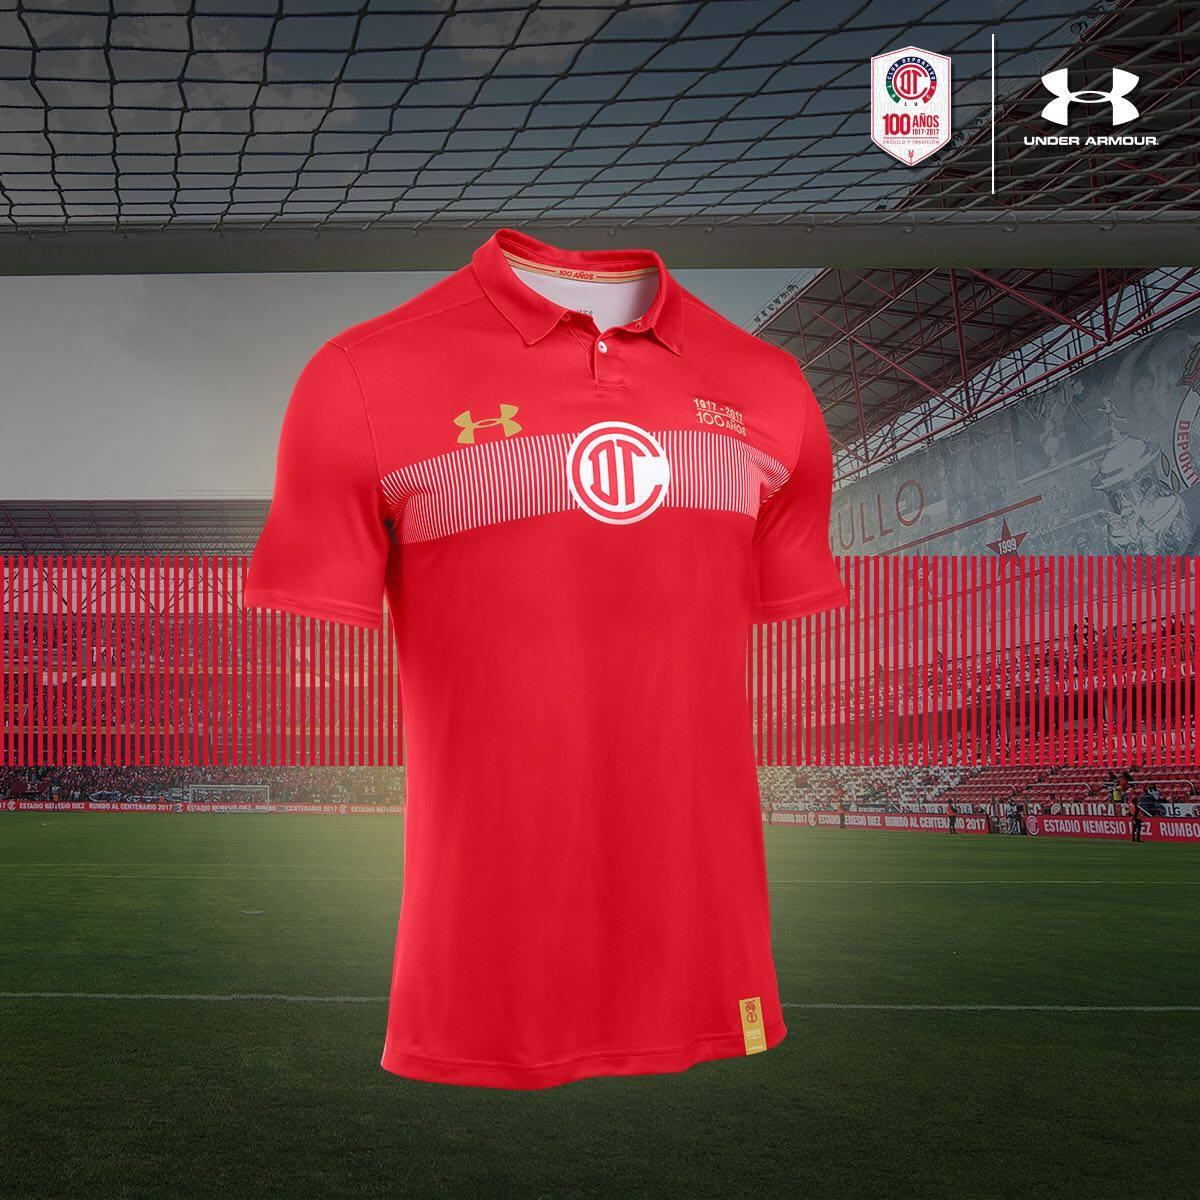 toluca-100th-anniversary-jersey-2.jpg